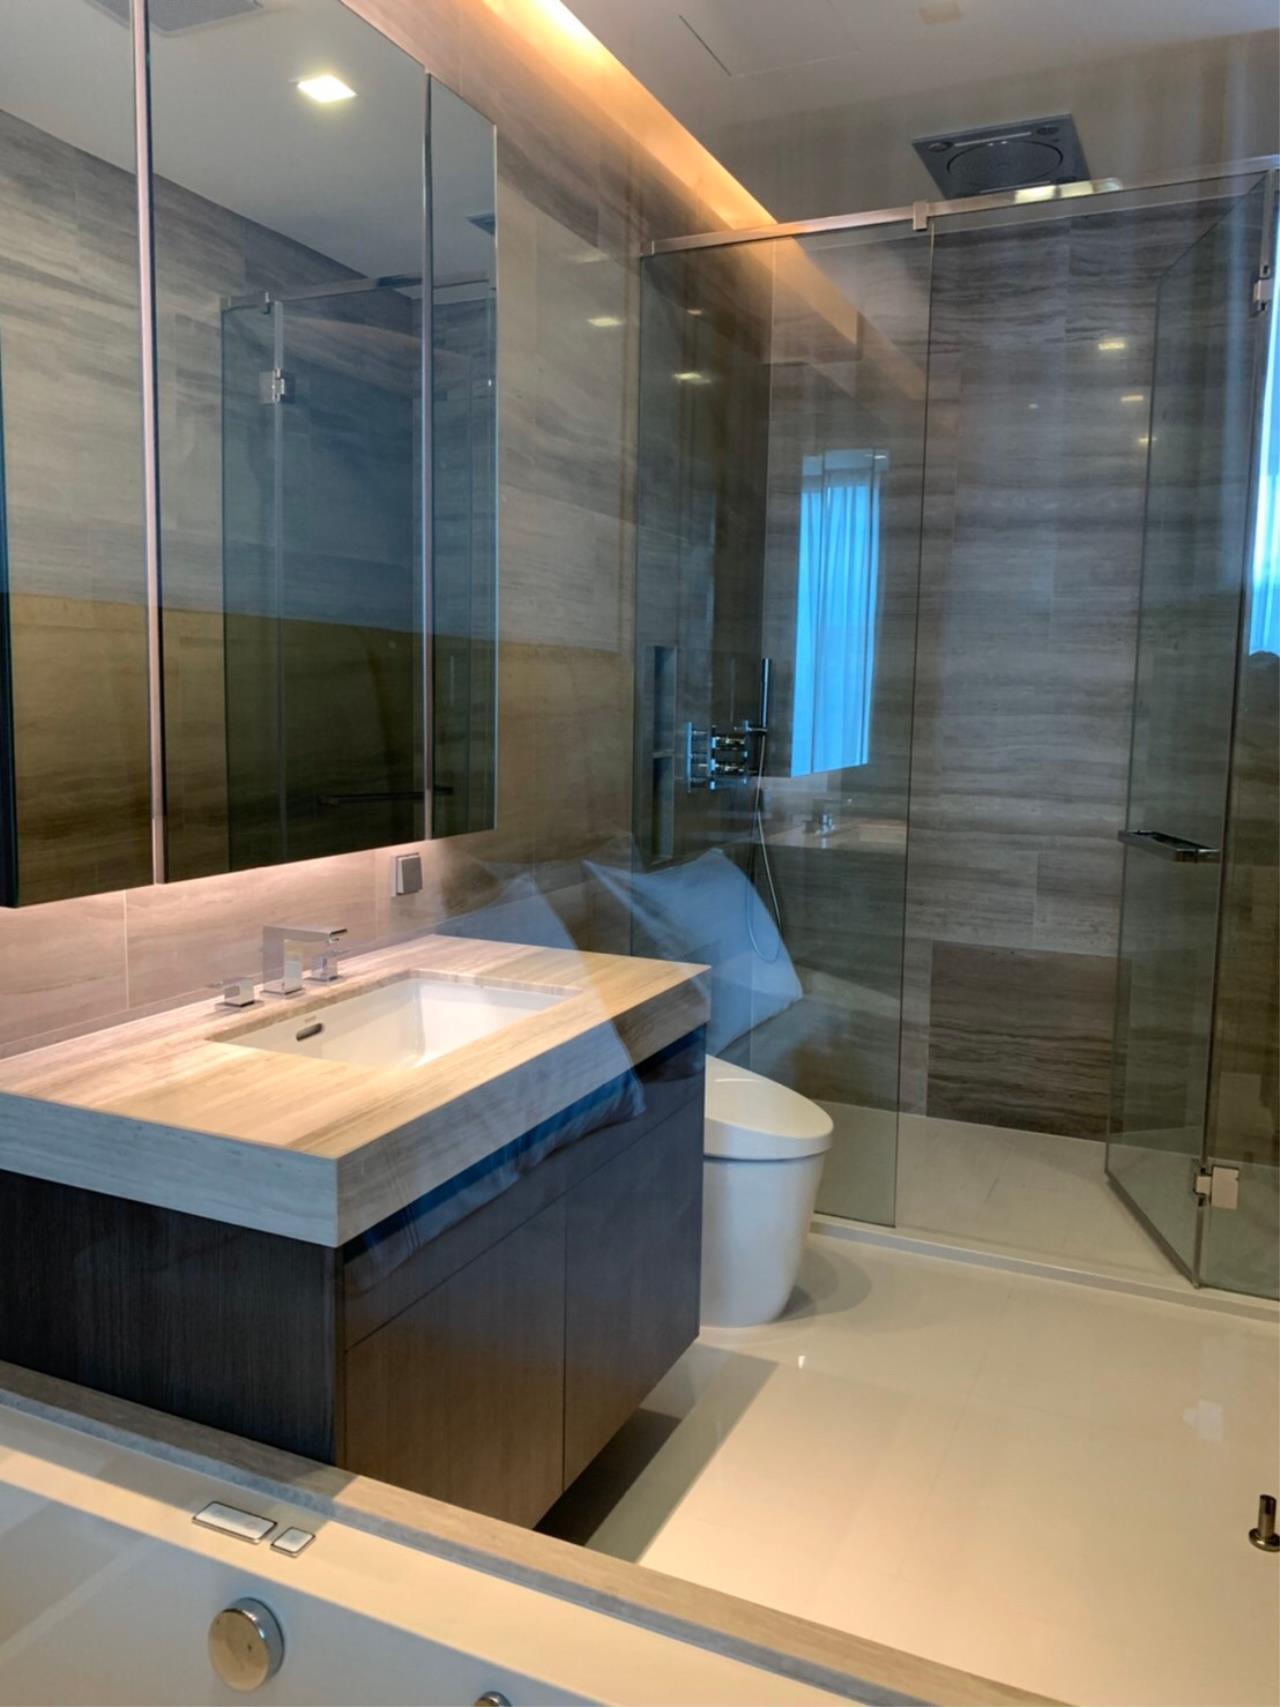 Bestbkkcondos Agency's Q sukhumvit at BTSnana - 92sqm - For Rent : 90 000 / month - 2 Bedrooms 2